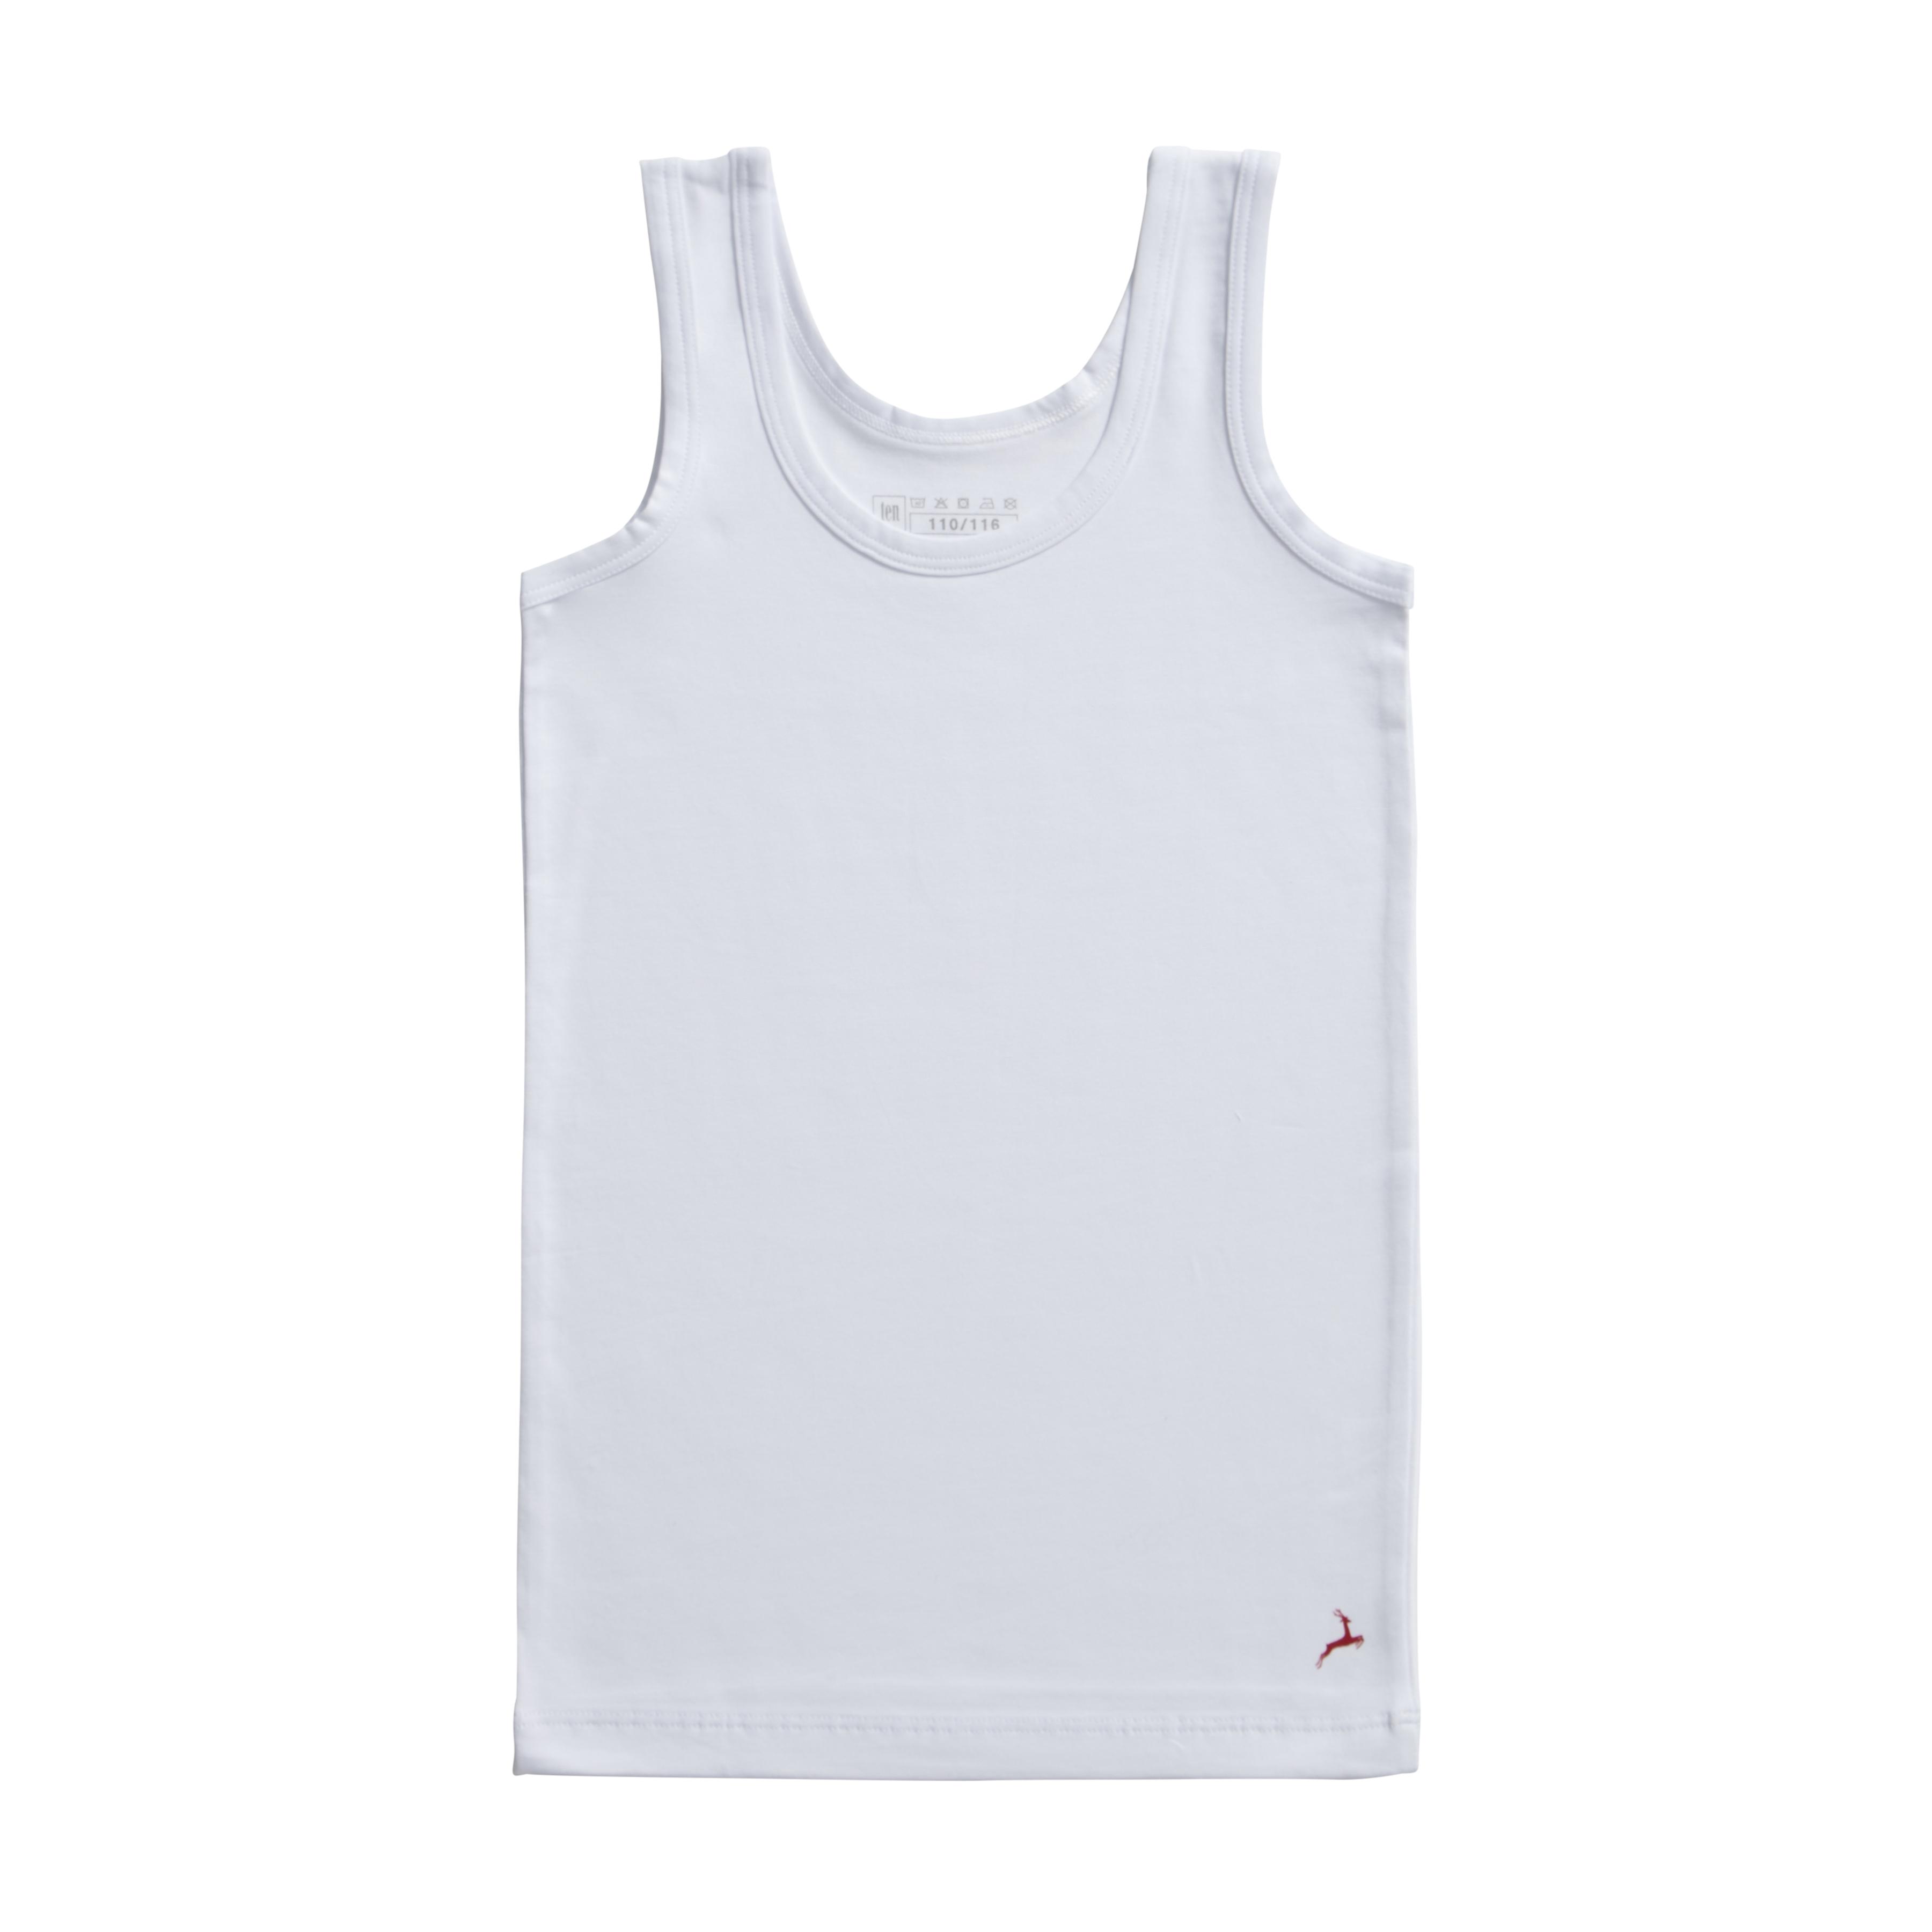 Ten Cate Kids Boys Shirt white